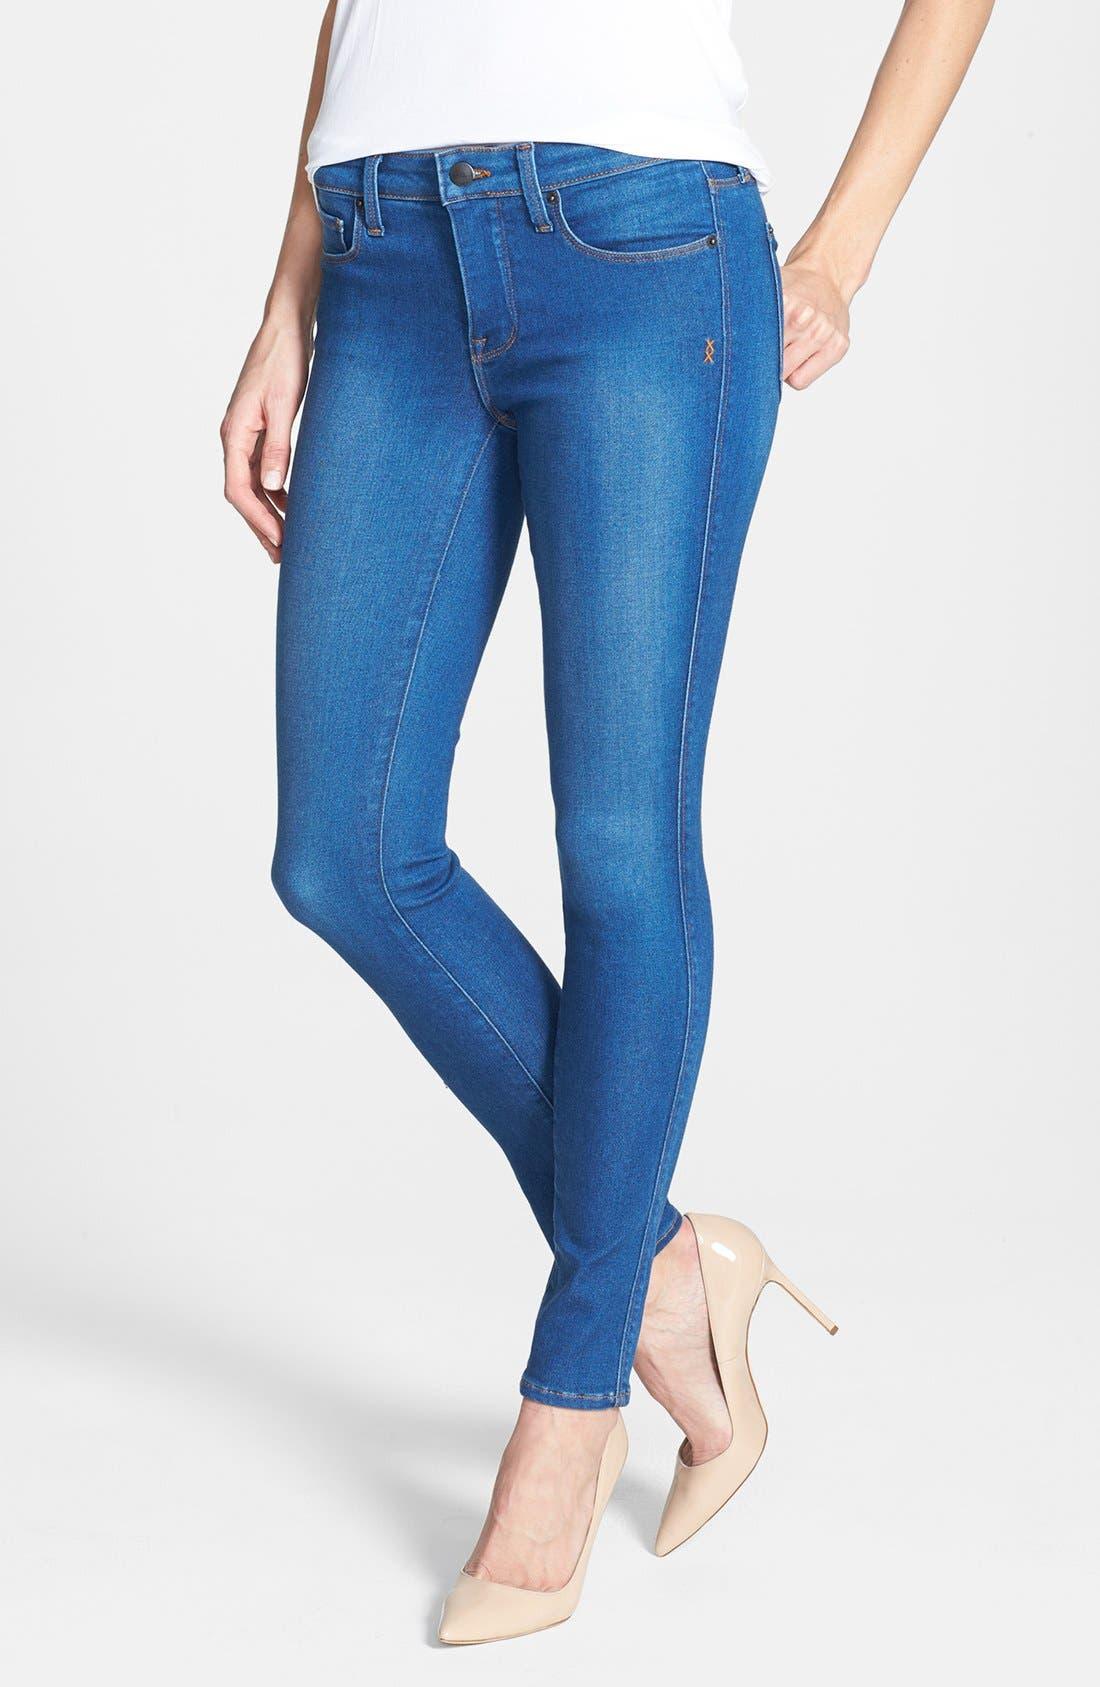 Alternate Image 1 Selected - Genetic 'Shya' Cigarette Skinny Jeans (Impact)